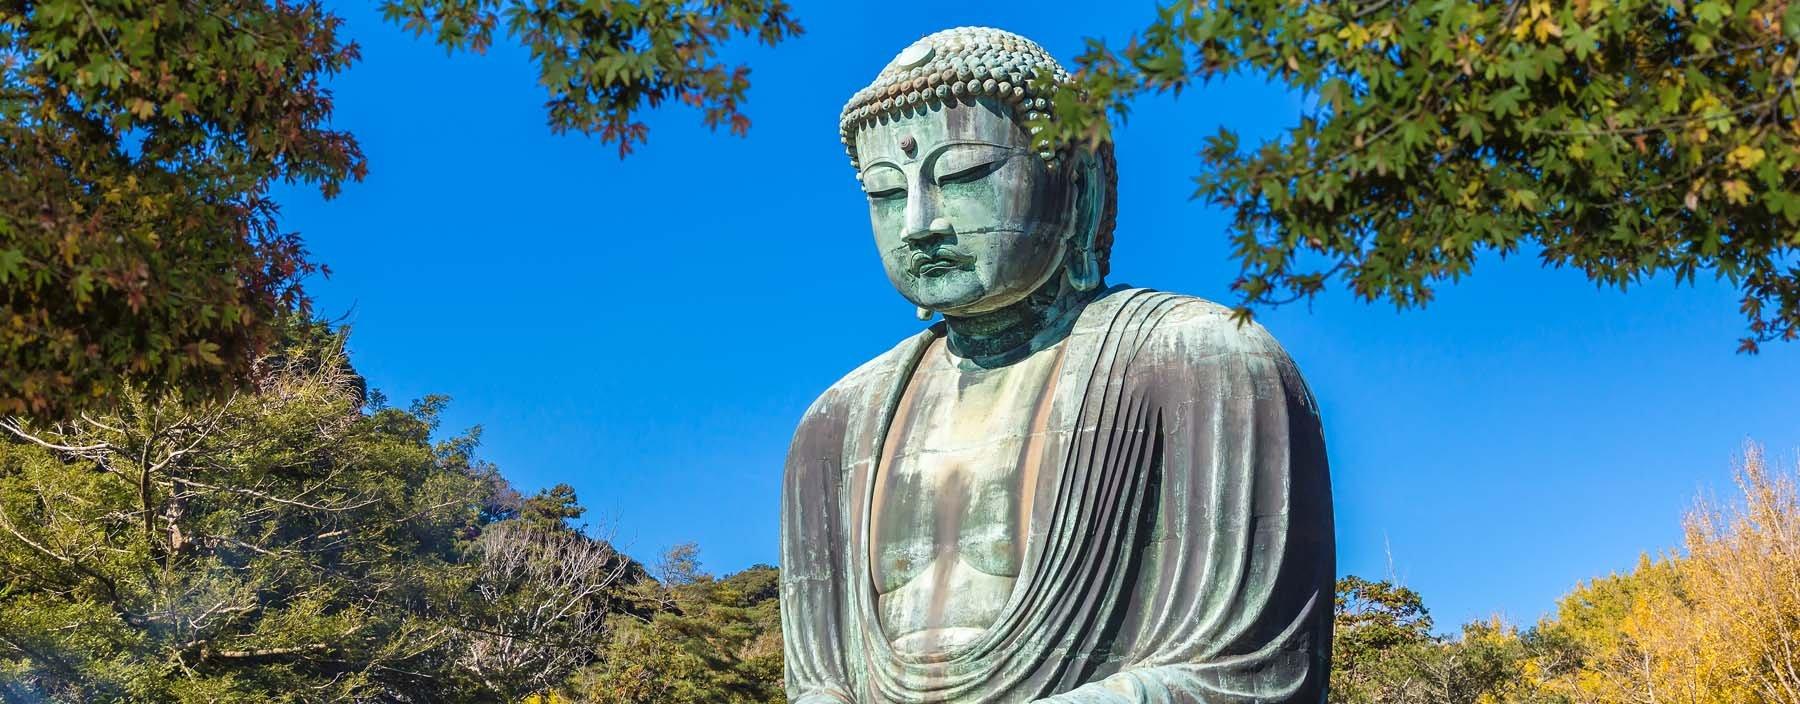 jp, kamakura, the great buddha (2).jpg